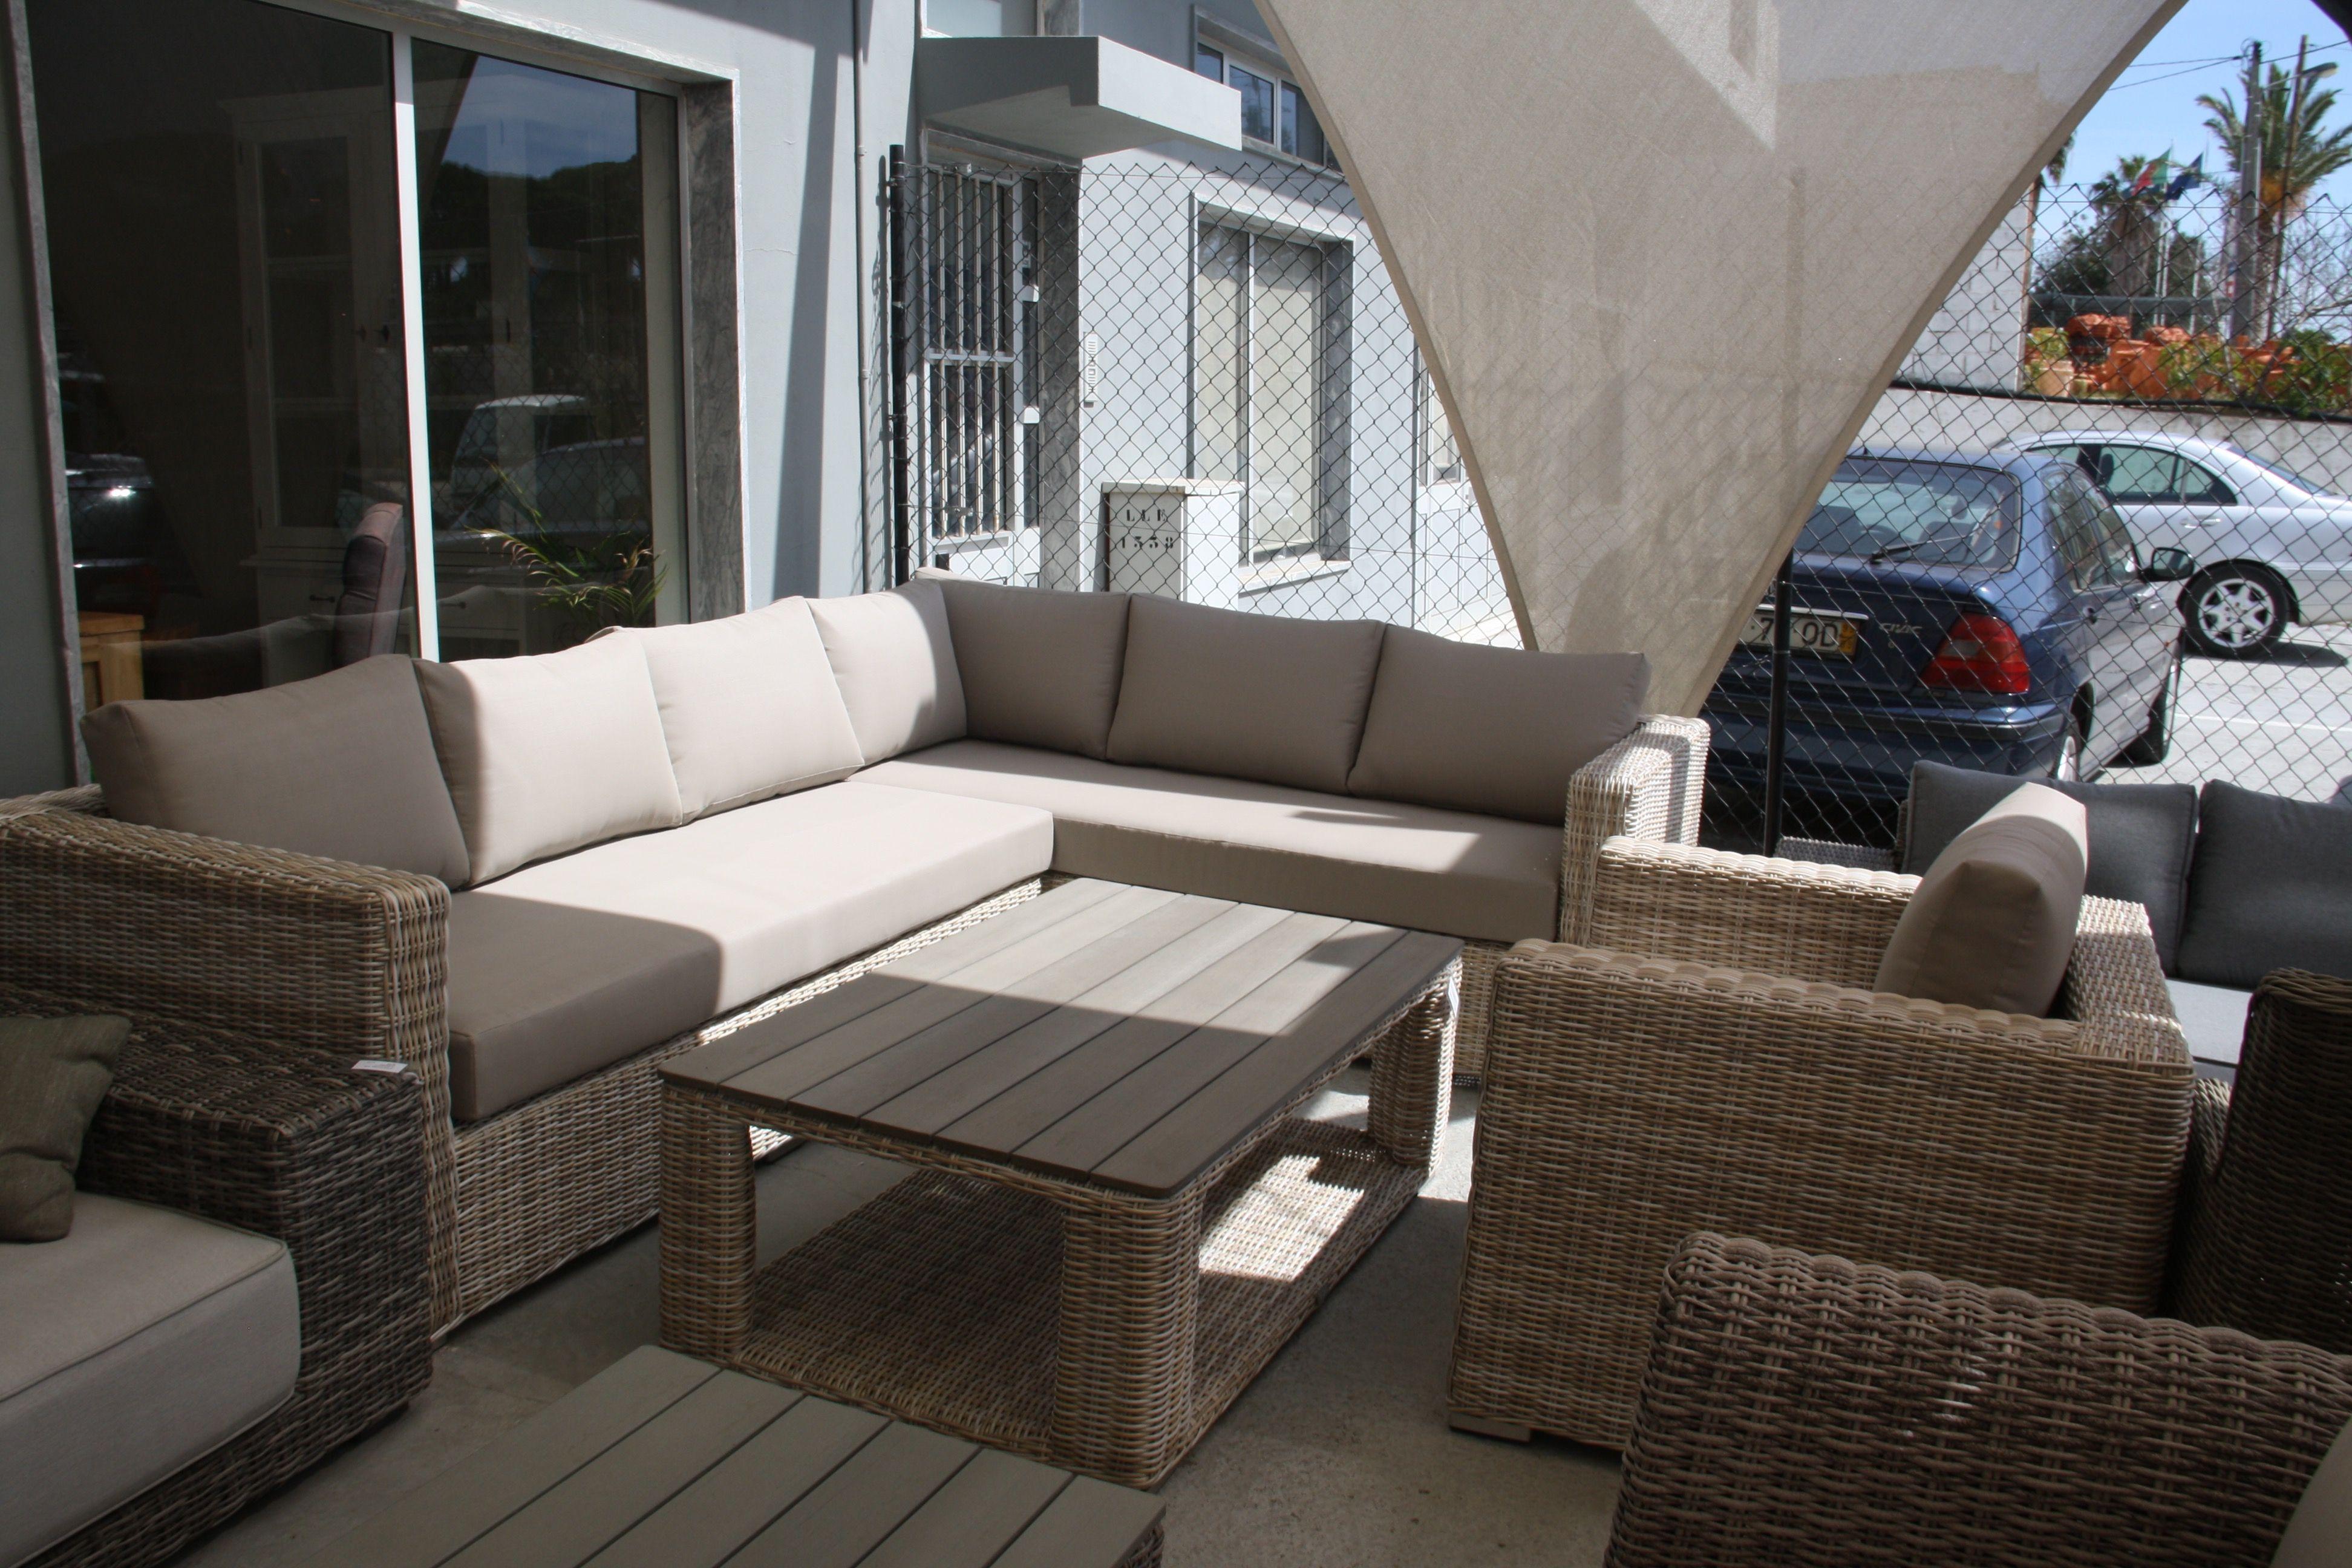 #loungeset #lounge #set #furniture #garden #wicker #rattan #portugal #design